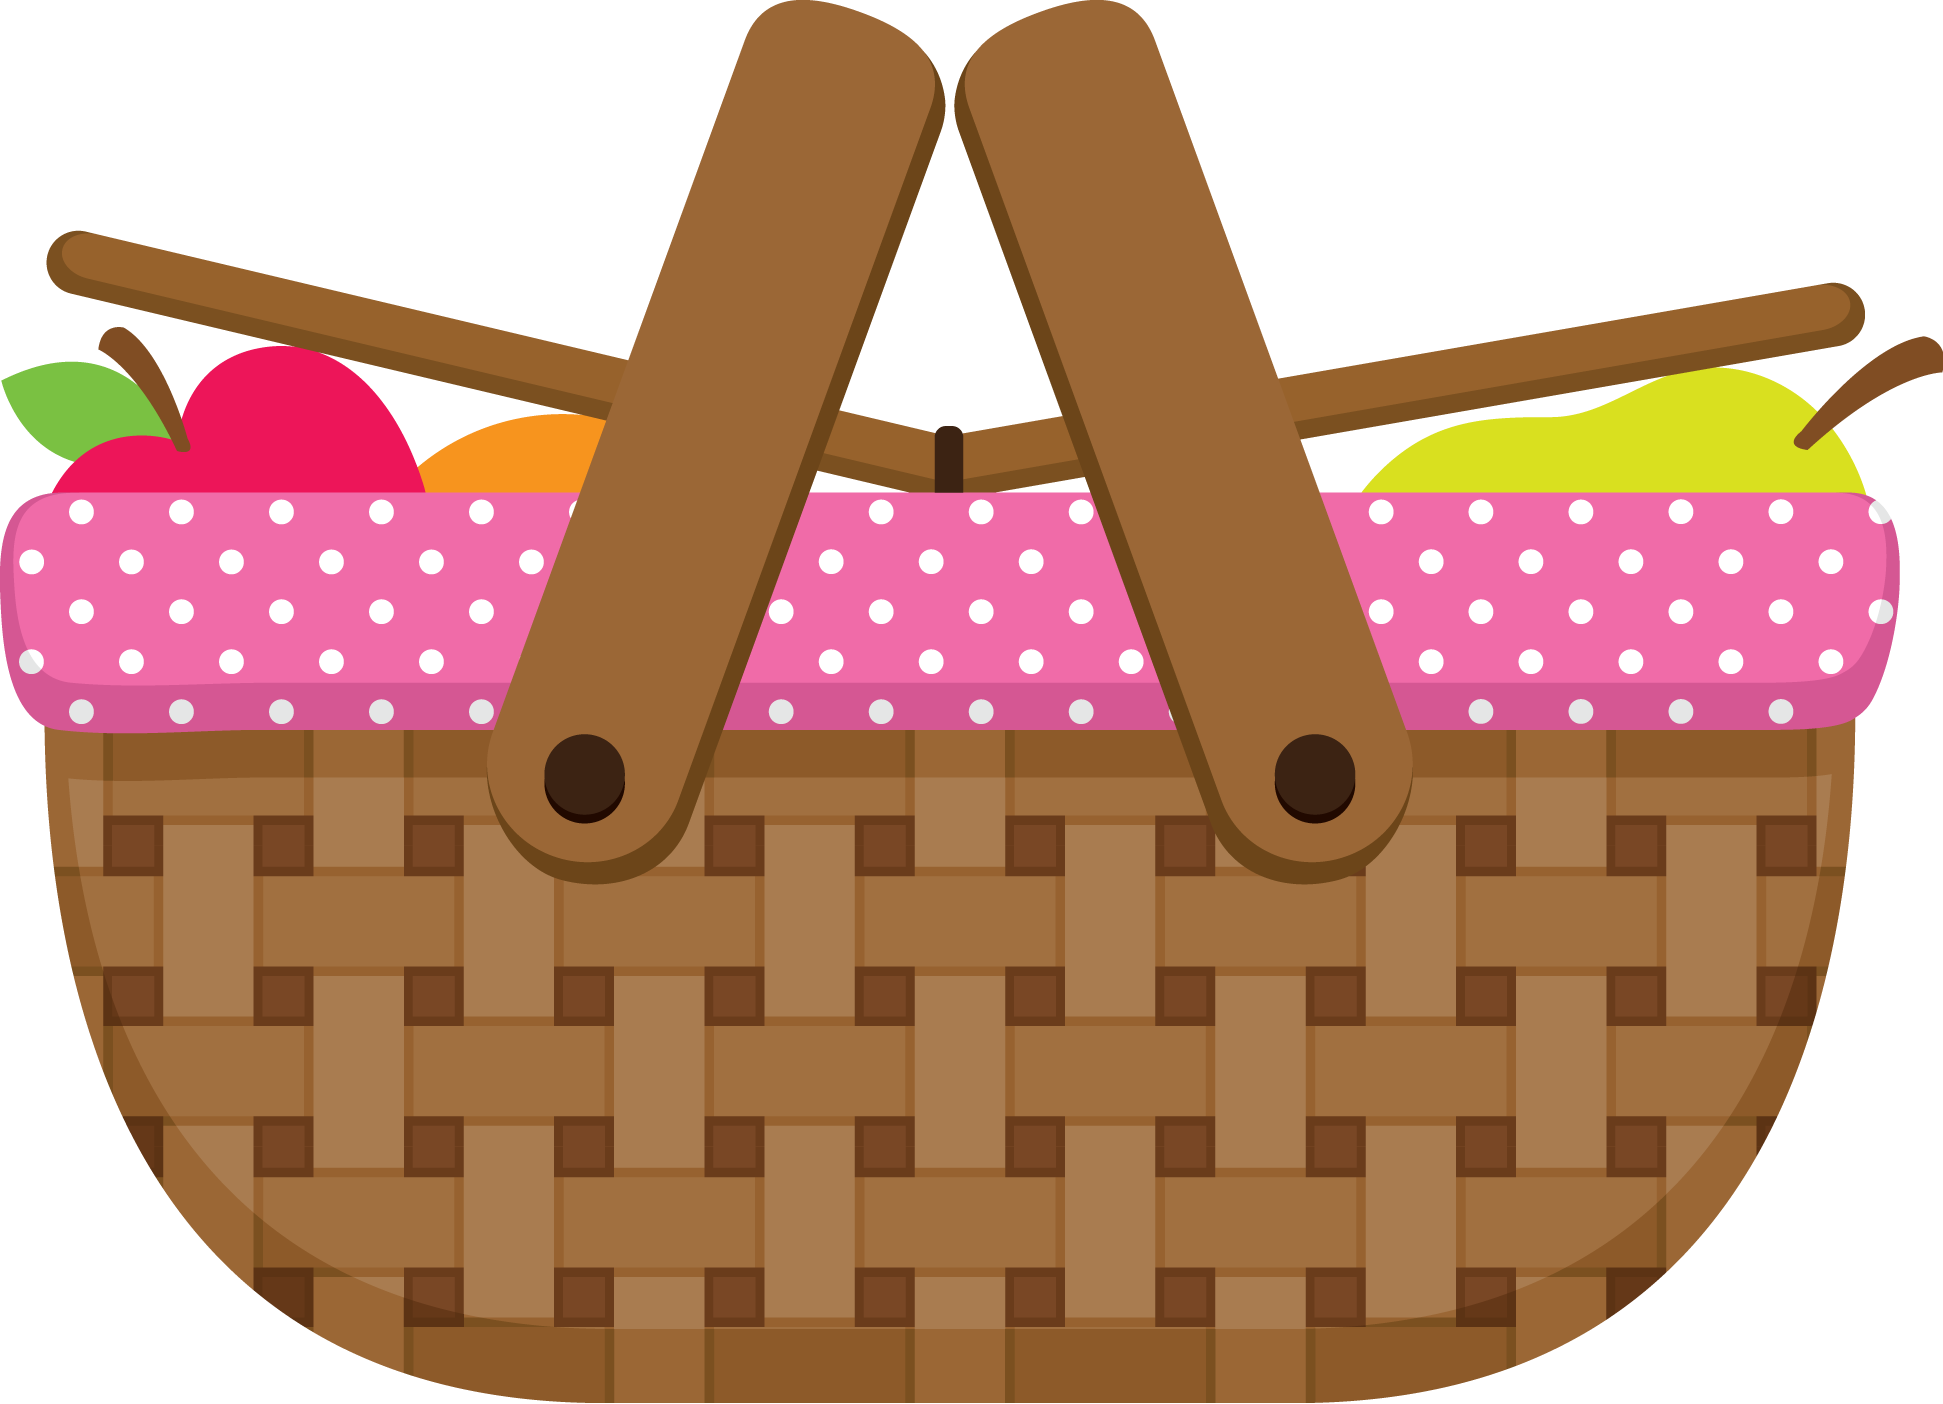 Picnic clipart picnic food, Picnic picnic food Transparent.